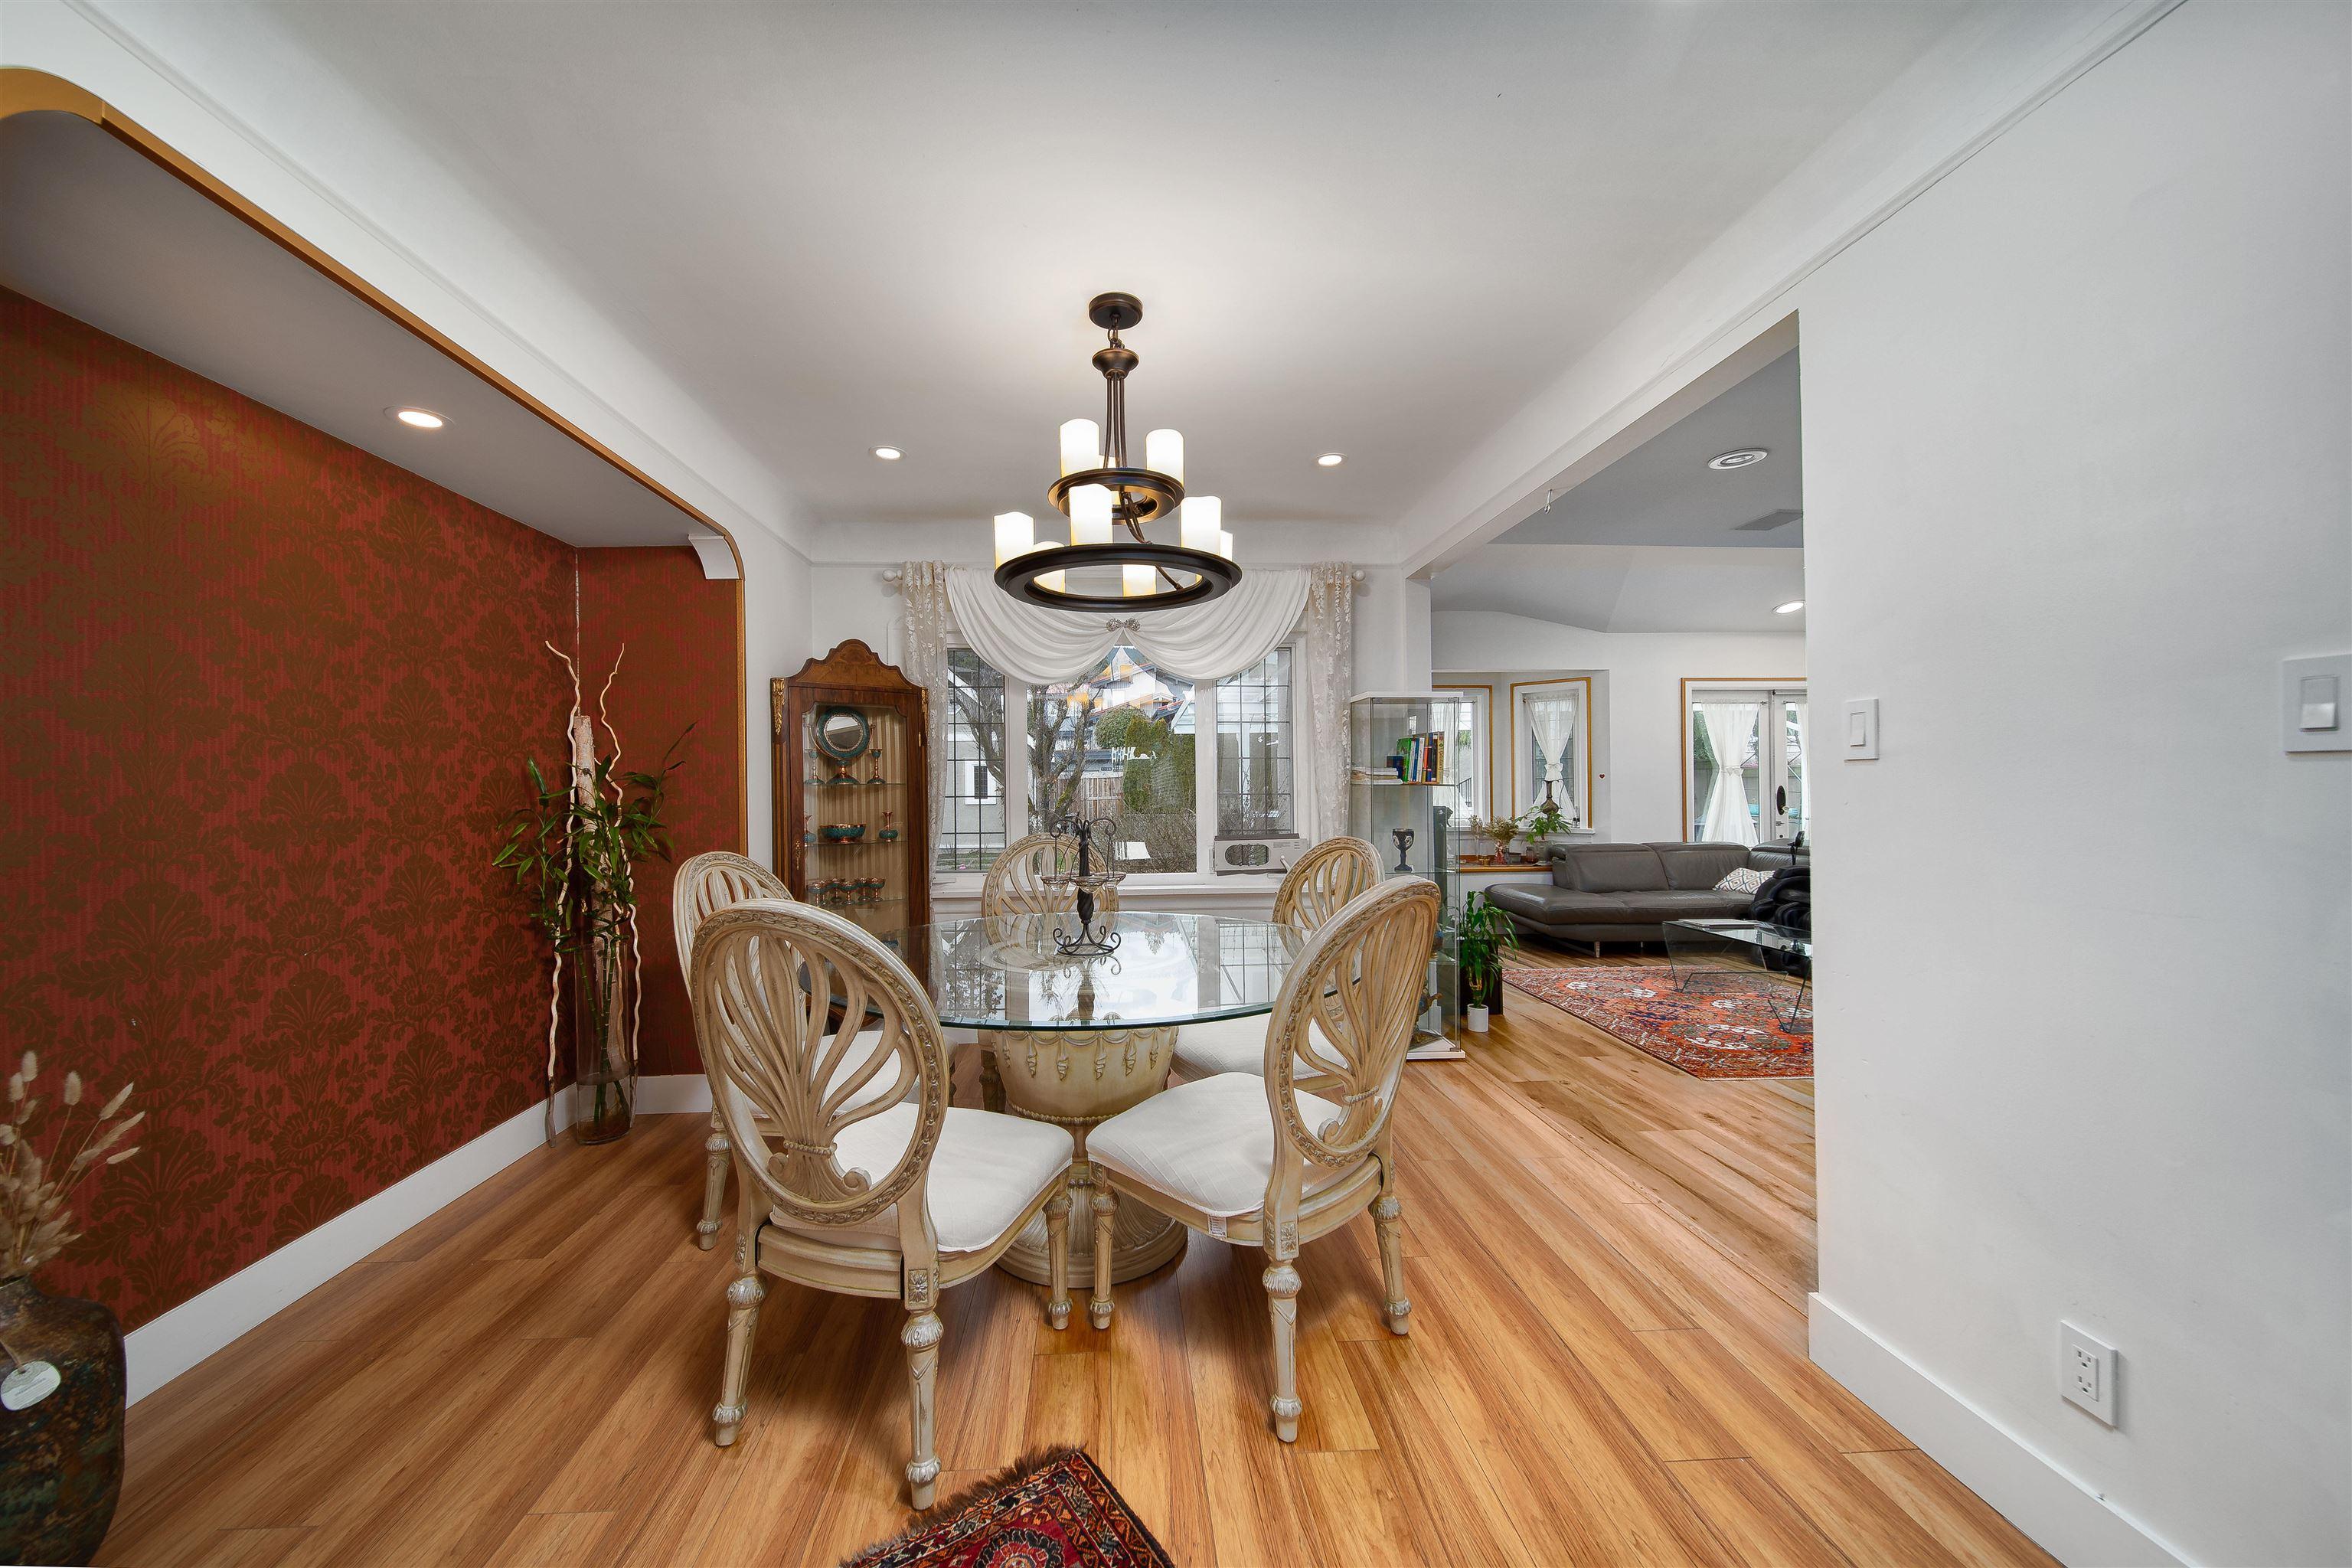 1357 FULTON AVENUE - Ambleside House/Single Family for sale, 6 Bedrooms (R2617731) - #12